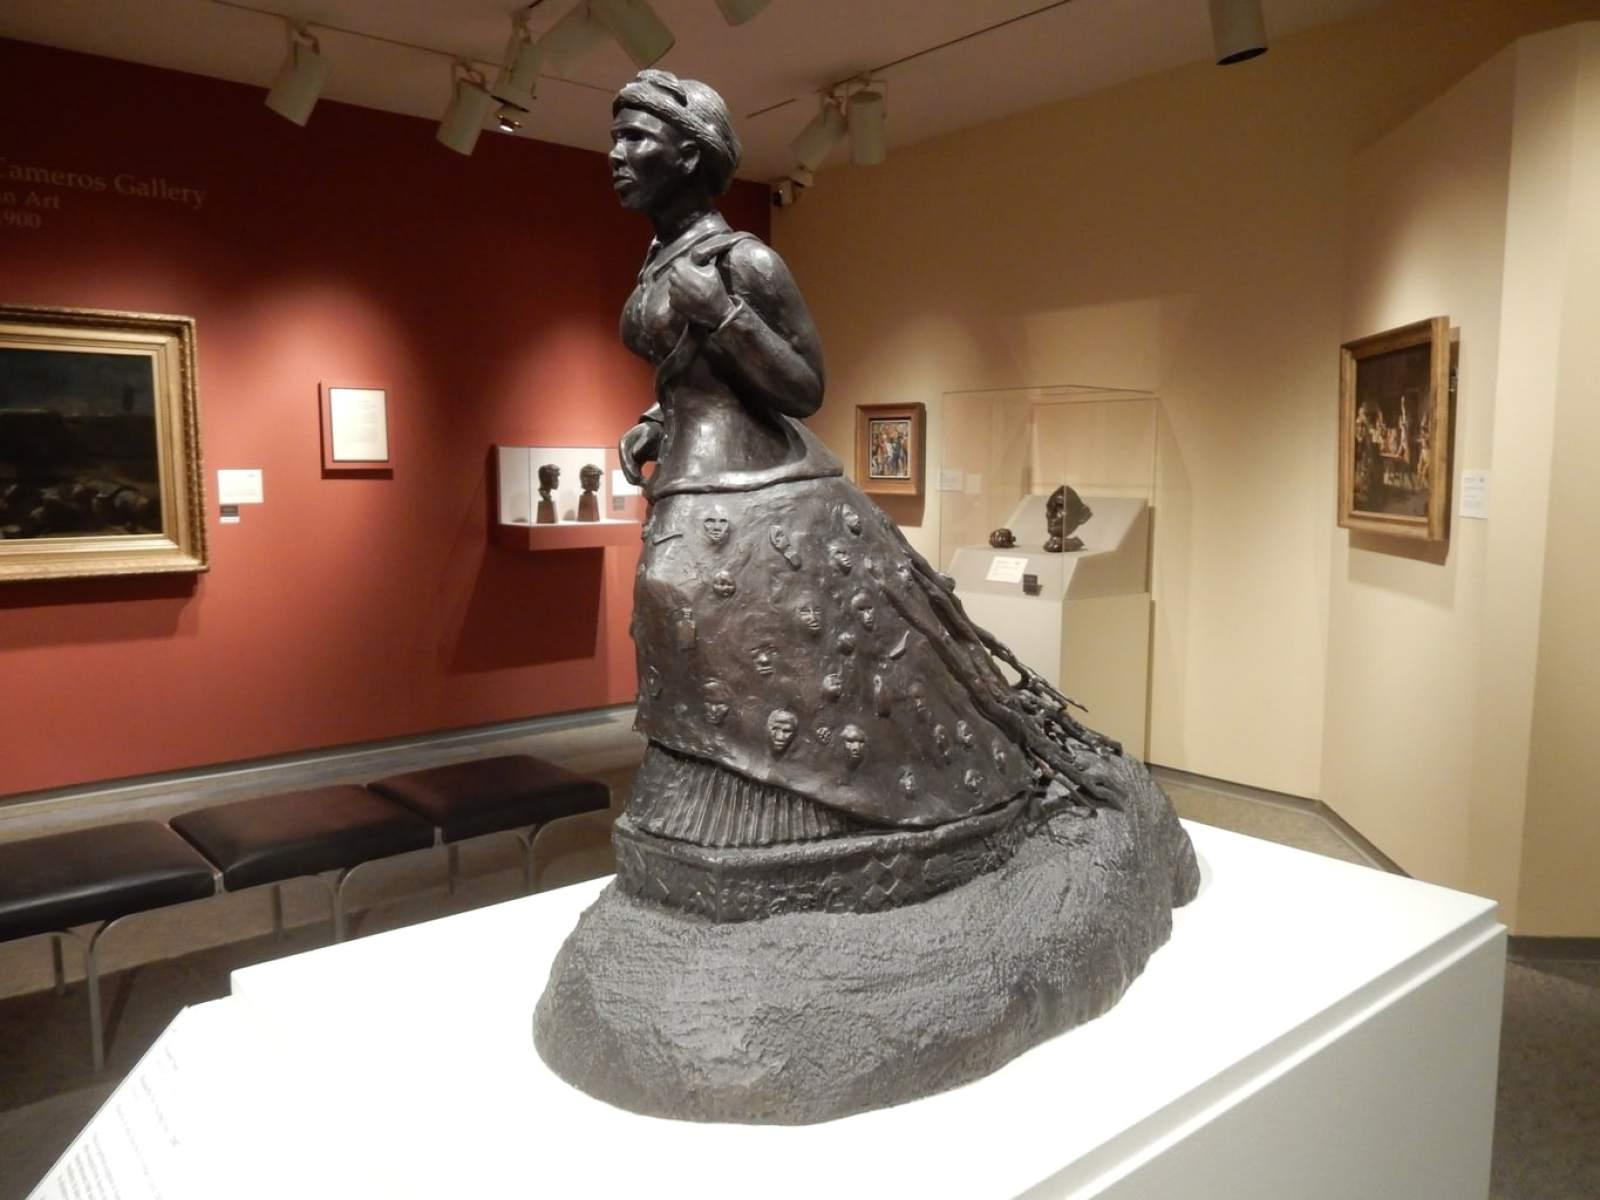 Harriet Tubman Sculpture Memorial Art Gallery Rochester NY